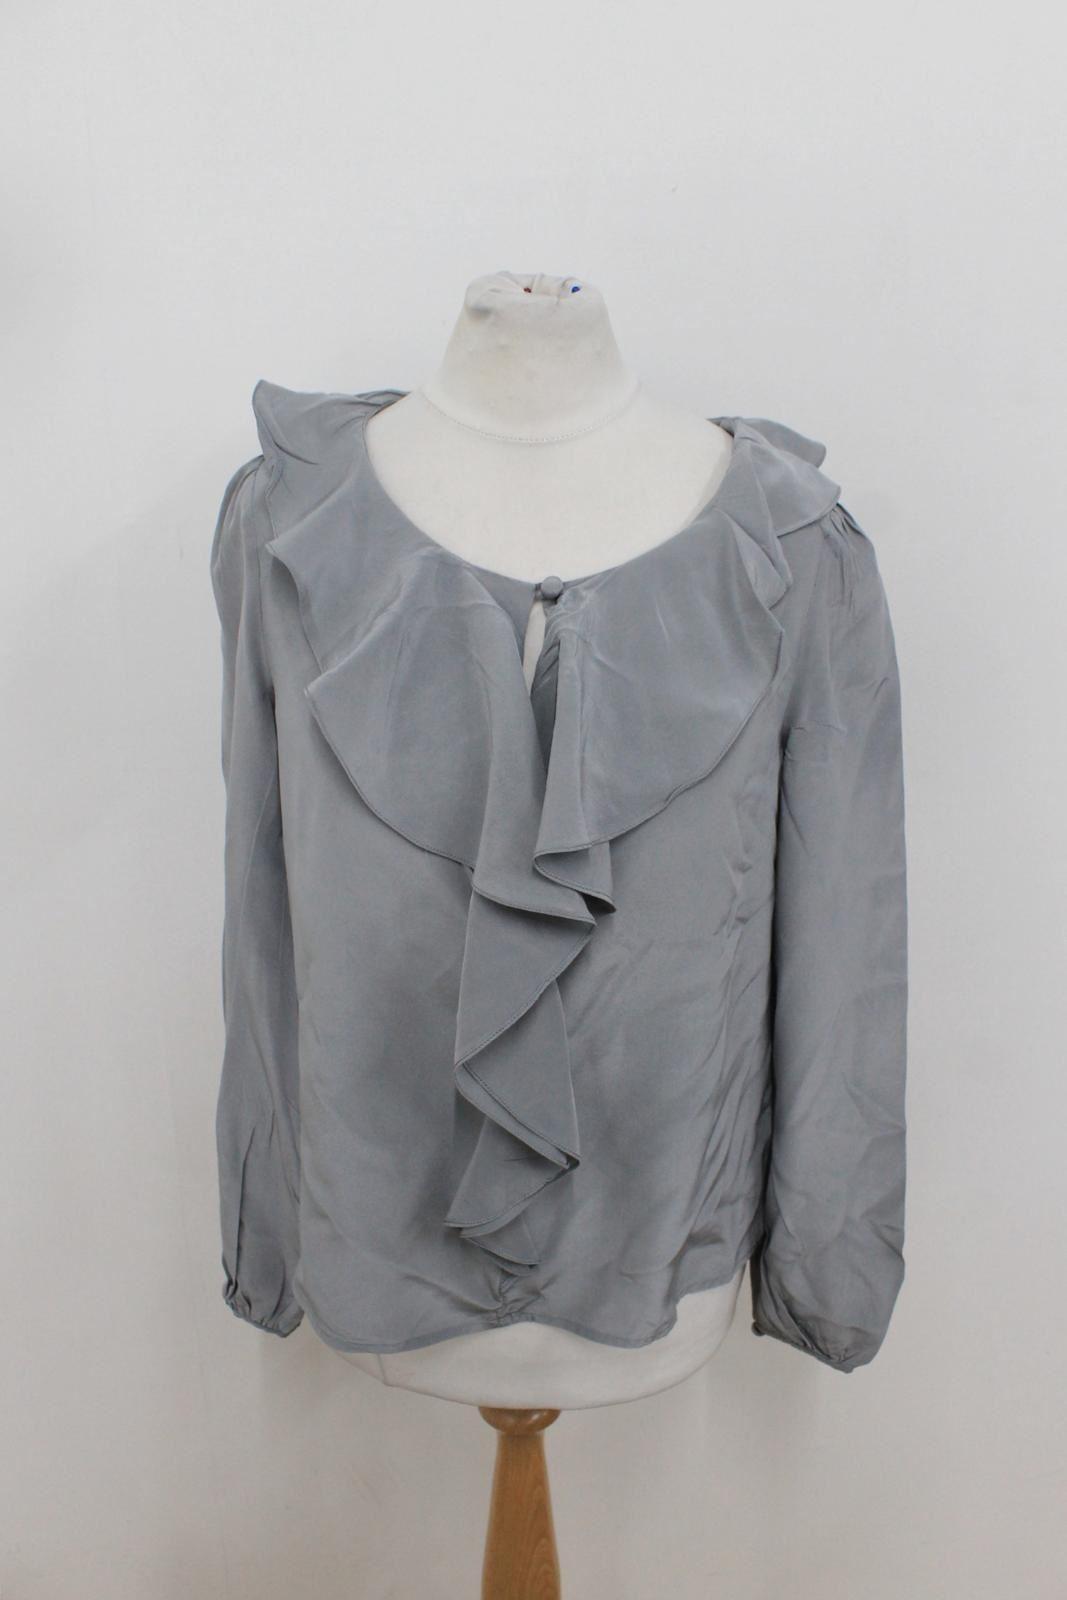 L-K-BENNETT-LONDON-Ladies-Grey-Silk-Frilled-Ruffle-Long-Sleeved-Blouse-Size-UK8